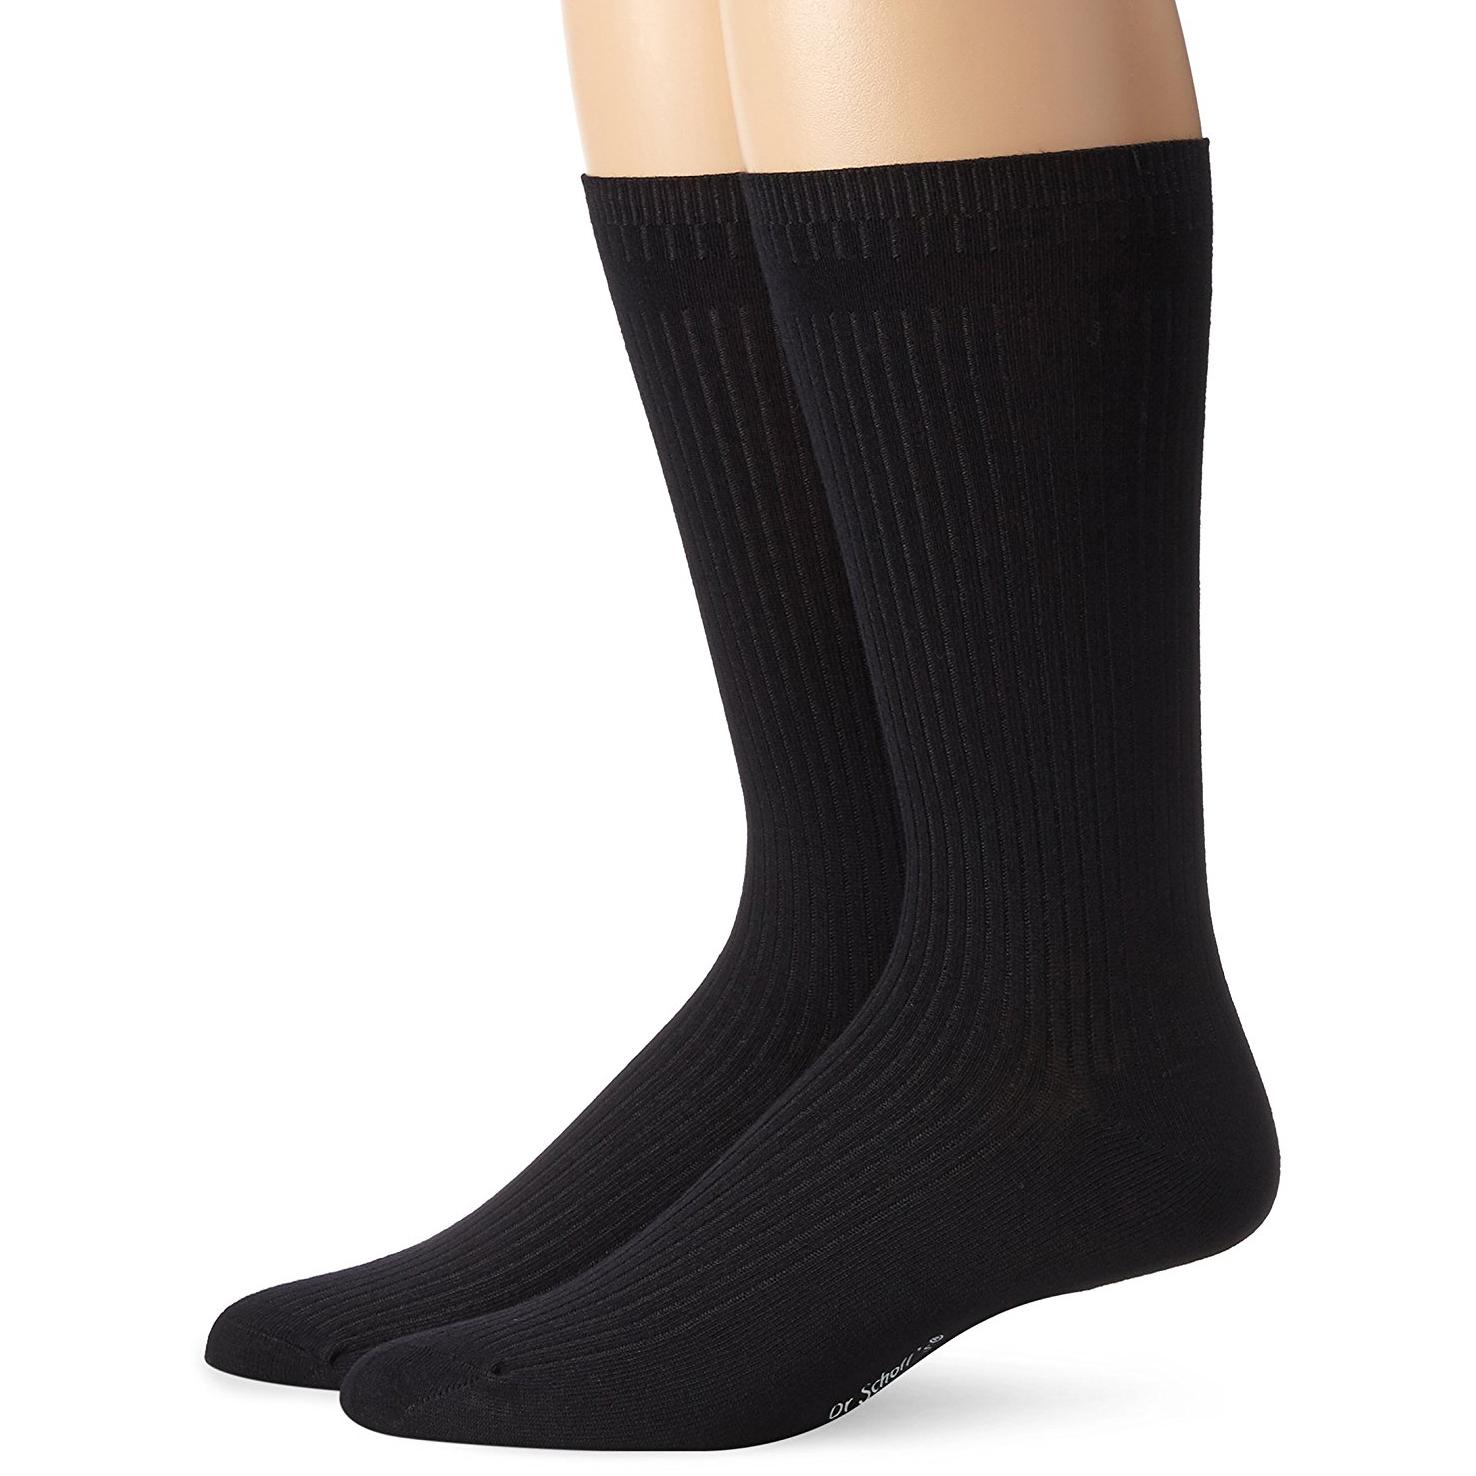 4-Pack Dr. Scholls Mens Careers Crew Dress Socks